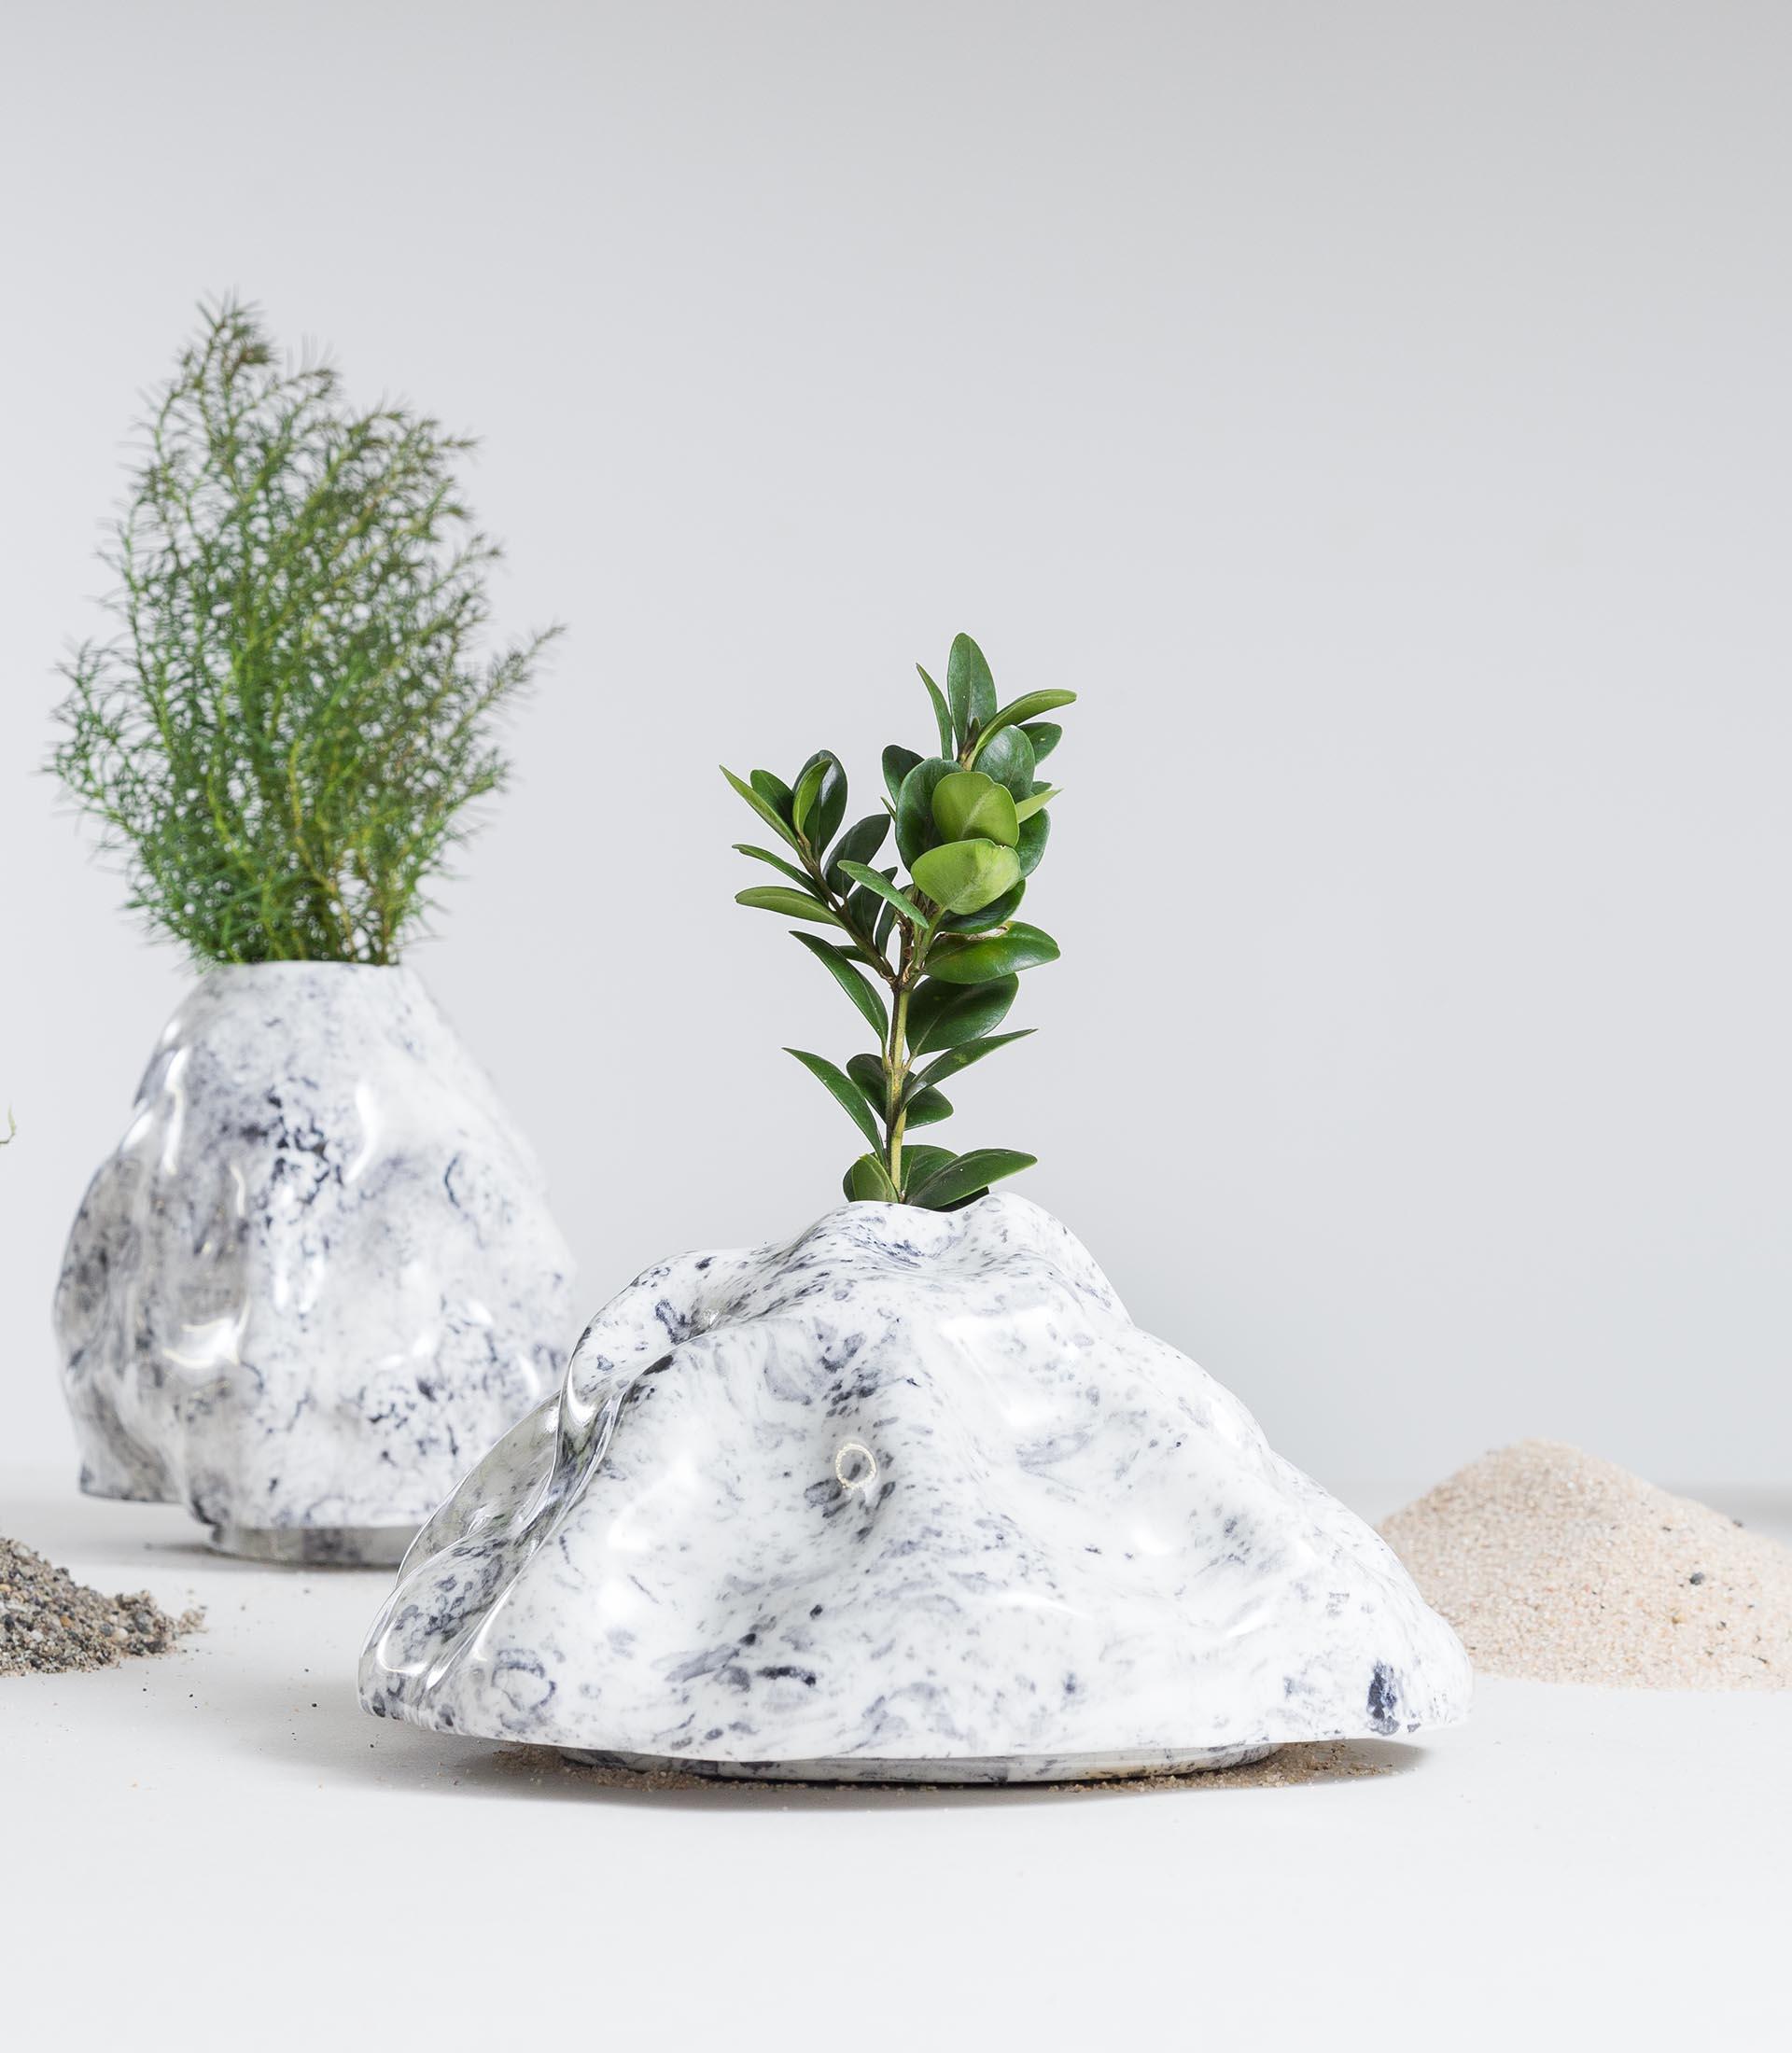 Tresor Basel, Laurin Schaub, Bushes and Trees, Porzellan